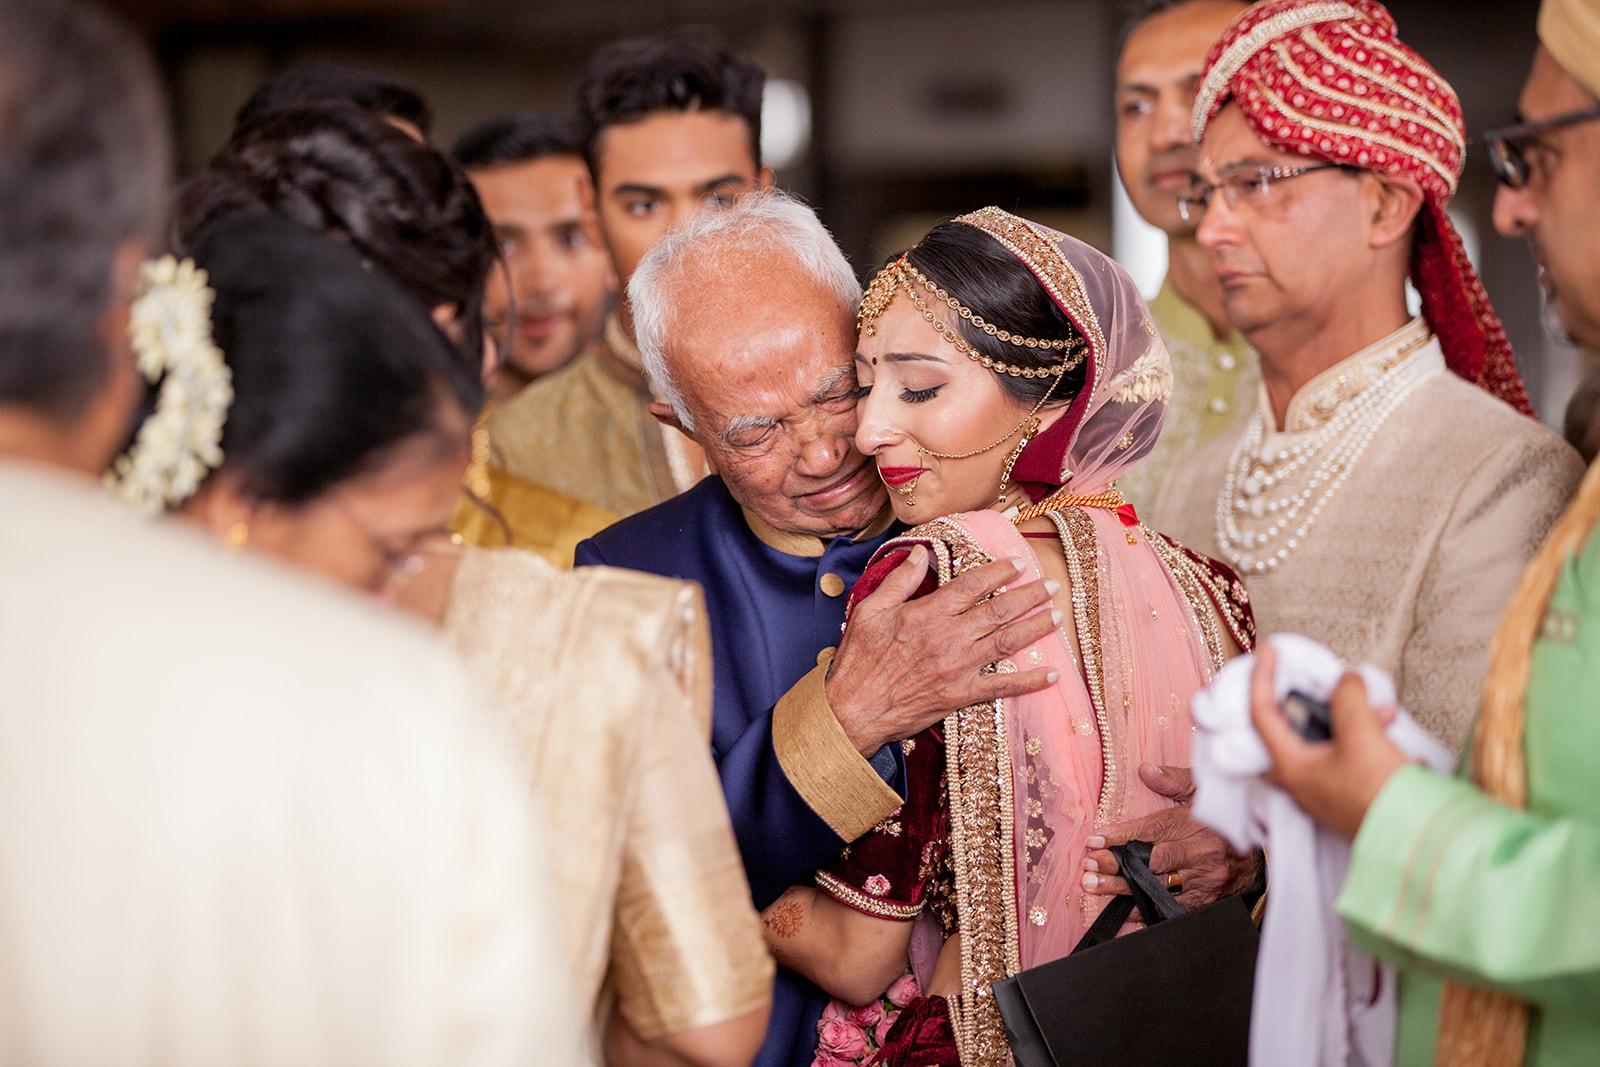 Le Cape Weddings - Puja and Kheelan - Vidai and Creatives -5.jpg